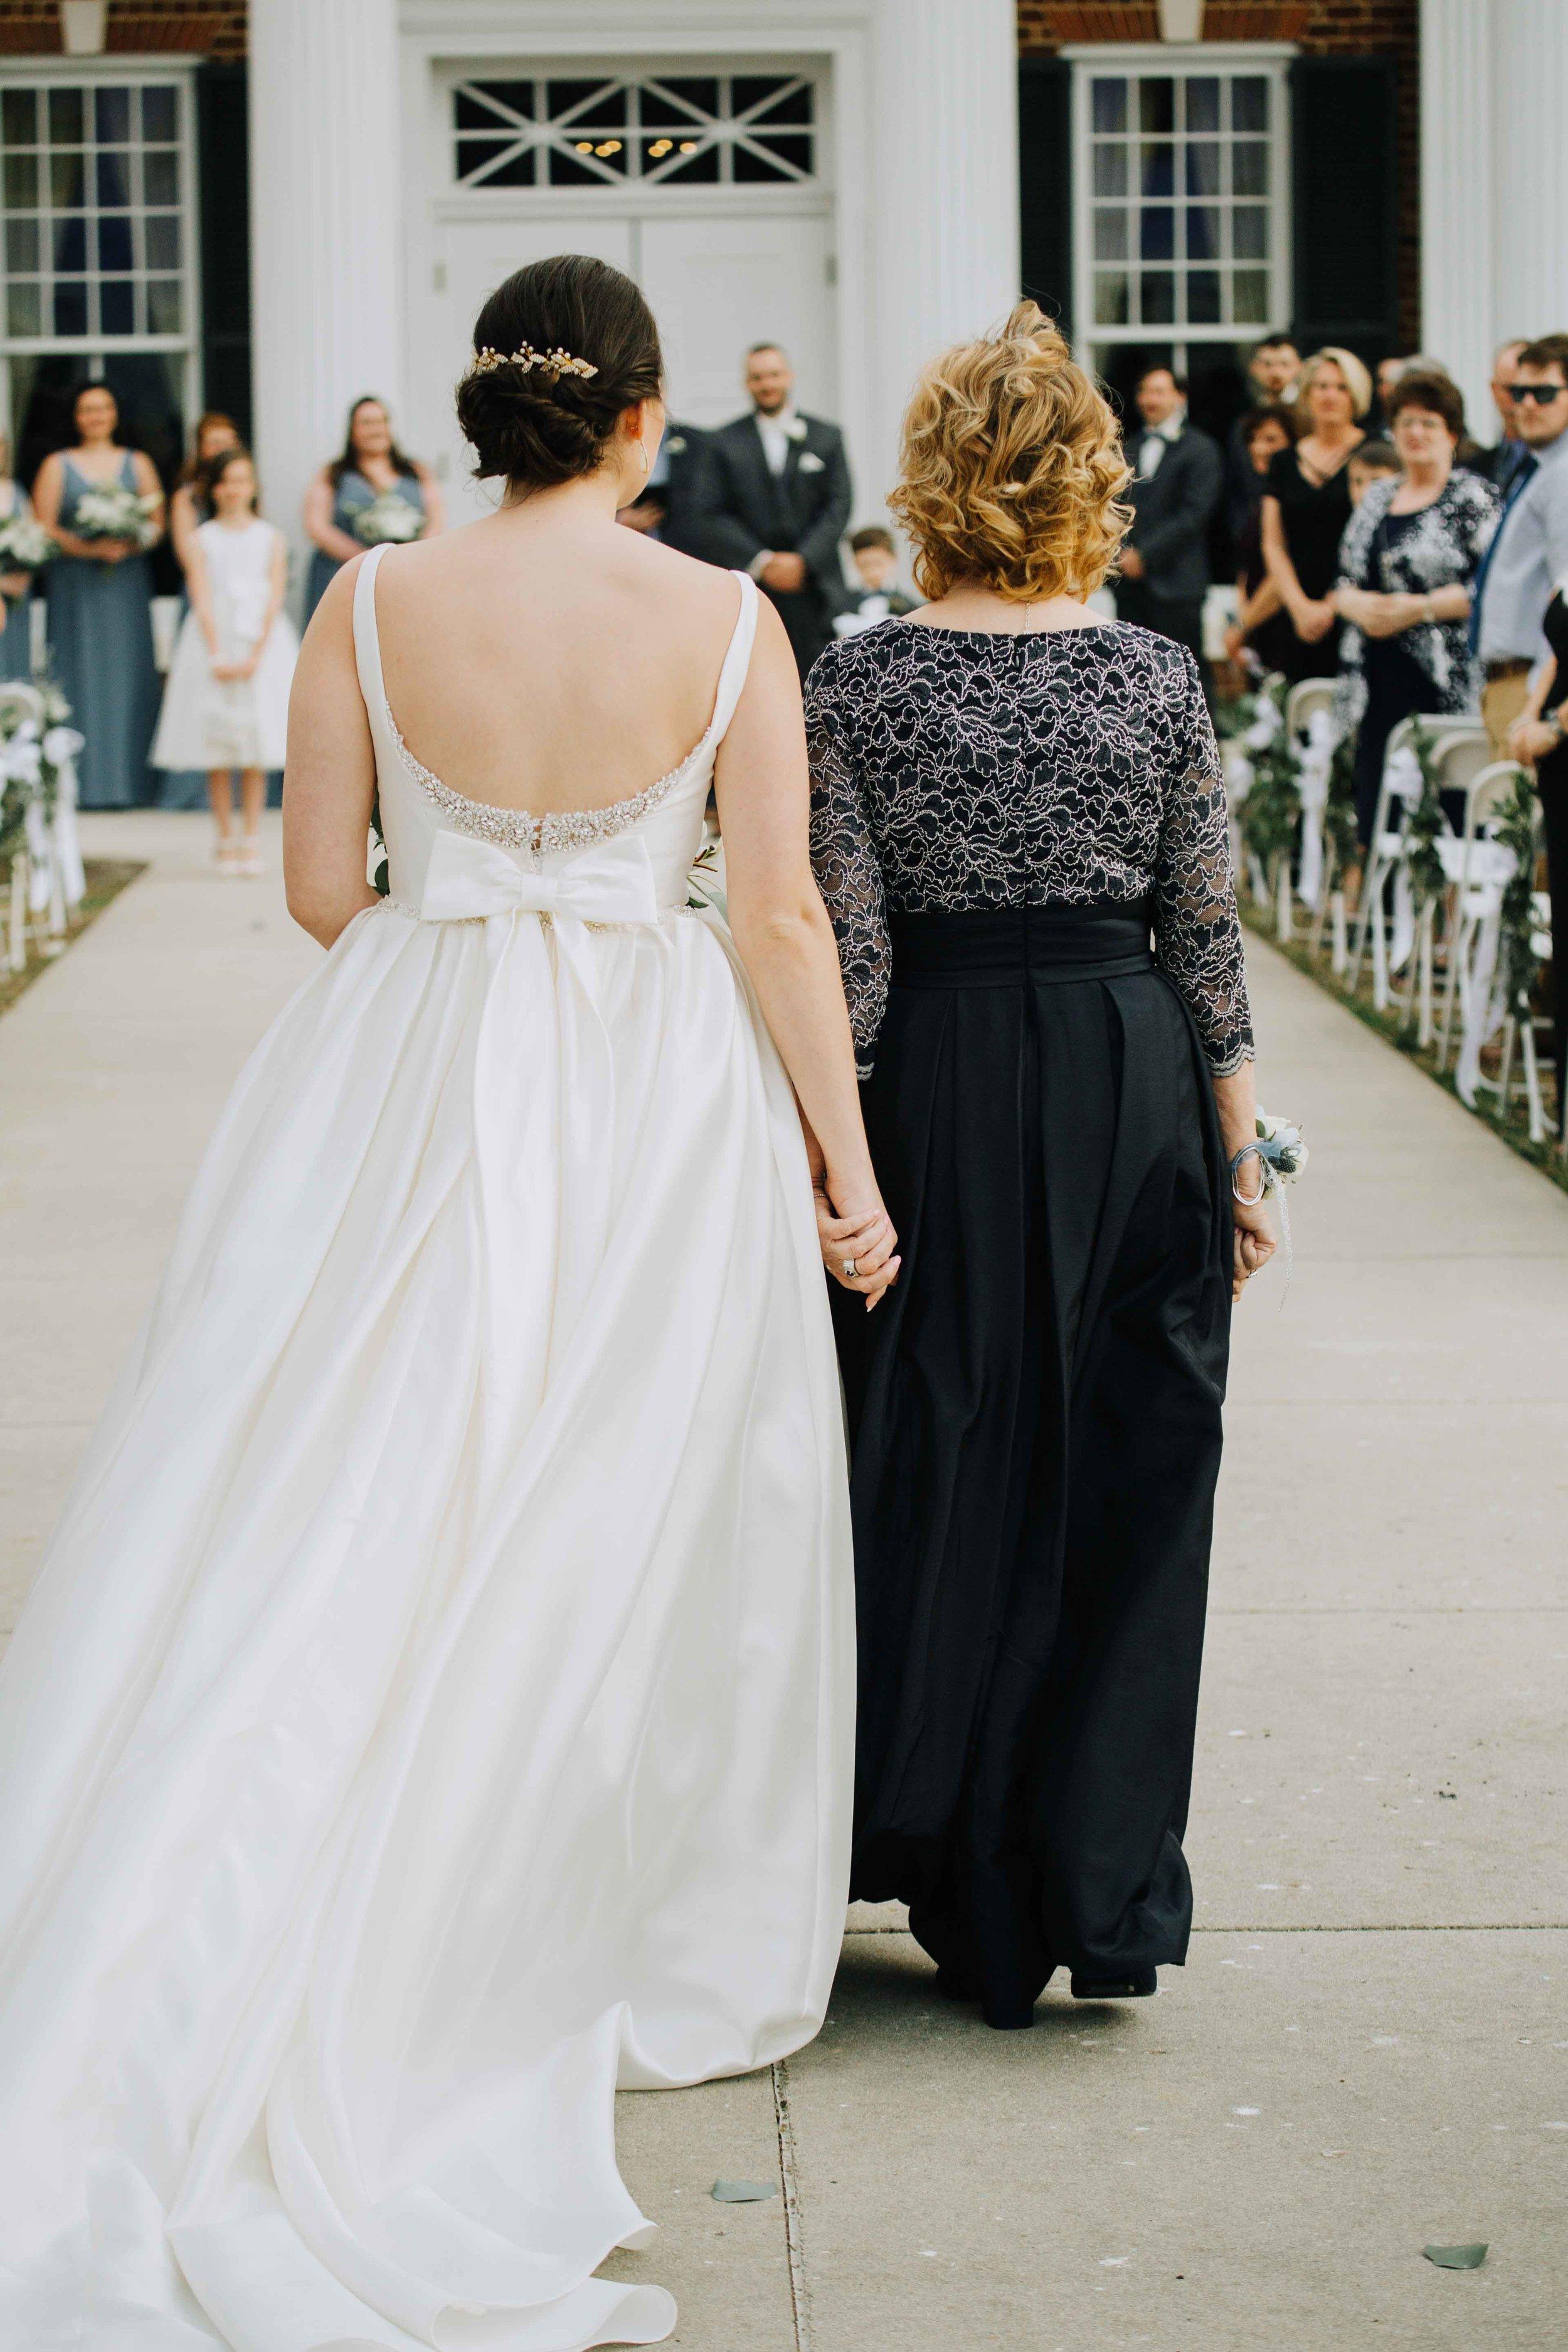 Farmville-Virginia-Wedding-Hotel-Weynoke-Downtown-Jacqueline-Waters-Photography-Detailed- (759).jpg